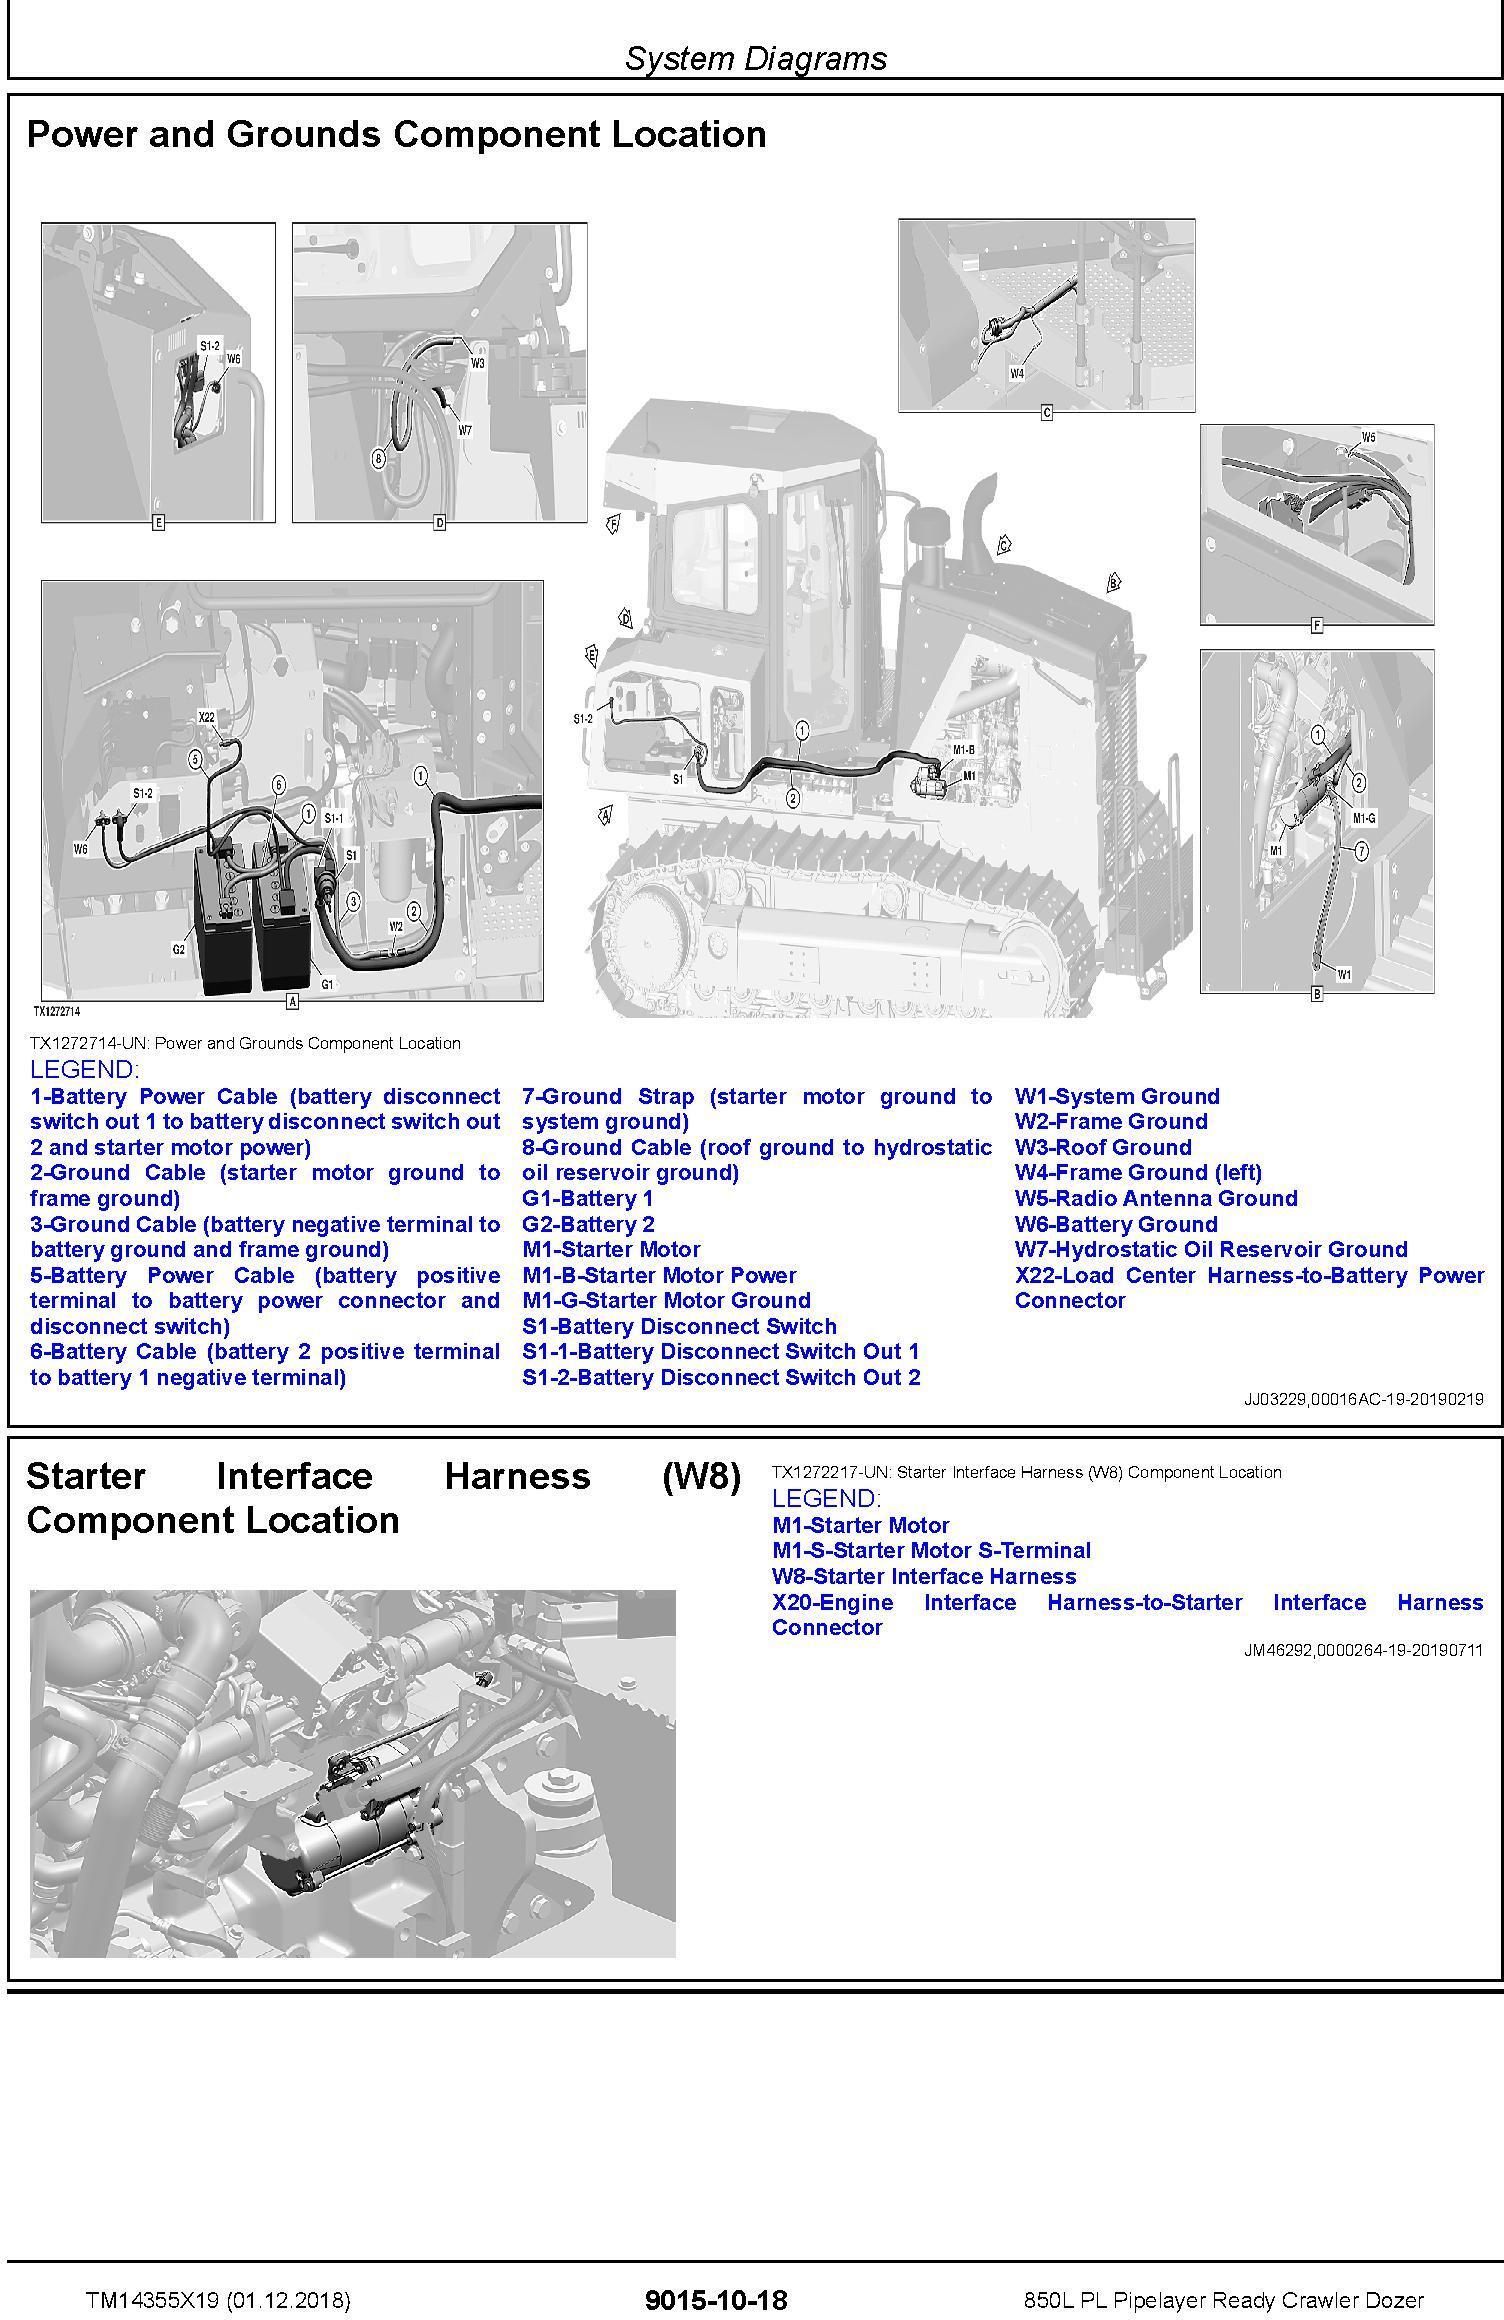 John Deere 850L PL Pipelayer Ready Crawler Dozer Operation & Test Technical Manual (TM14355X19) - 1